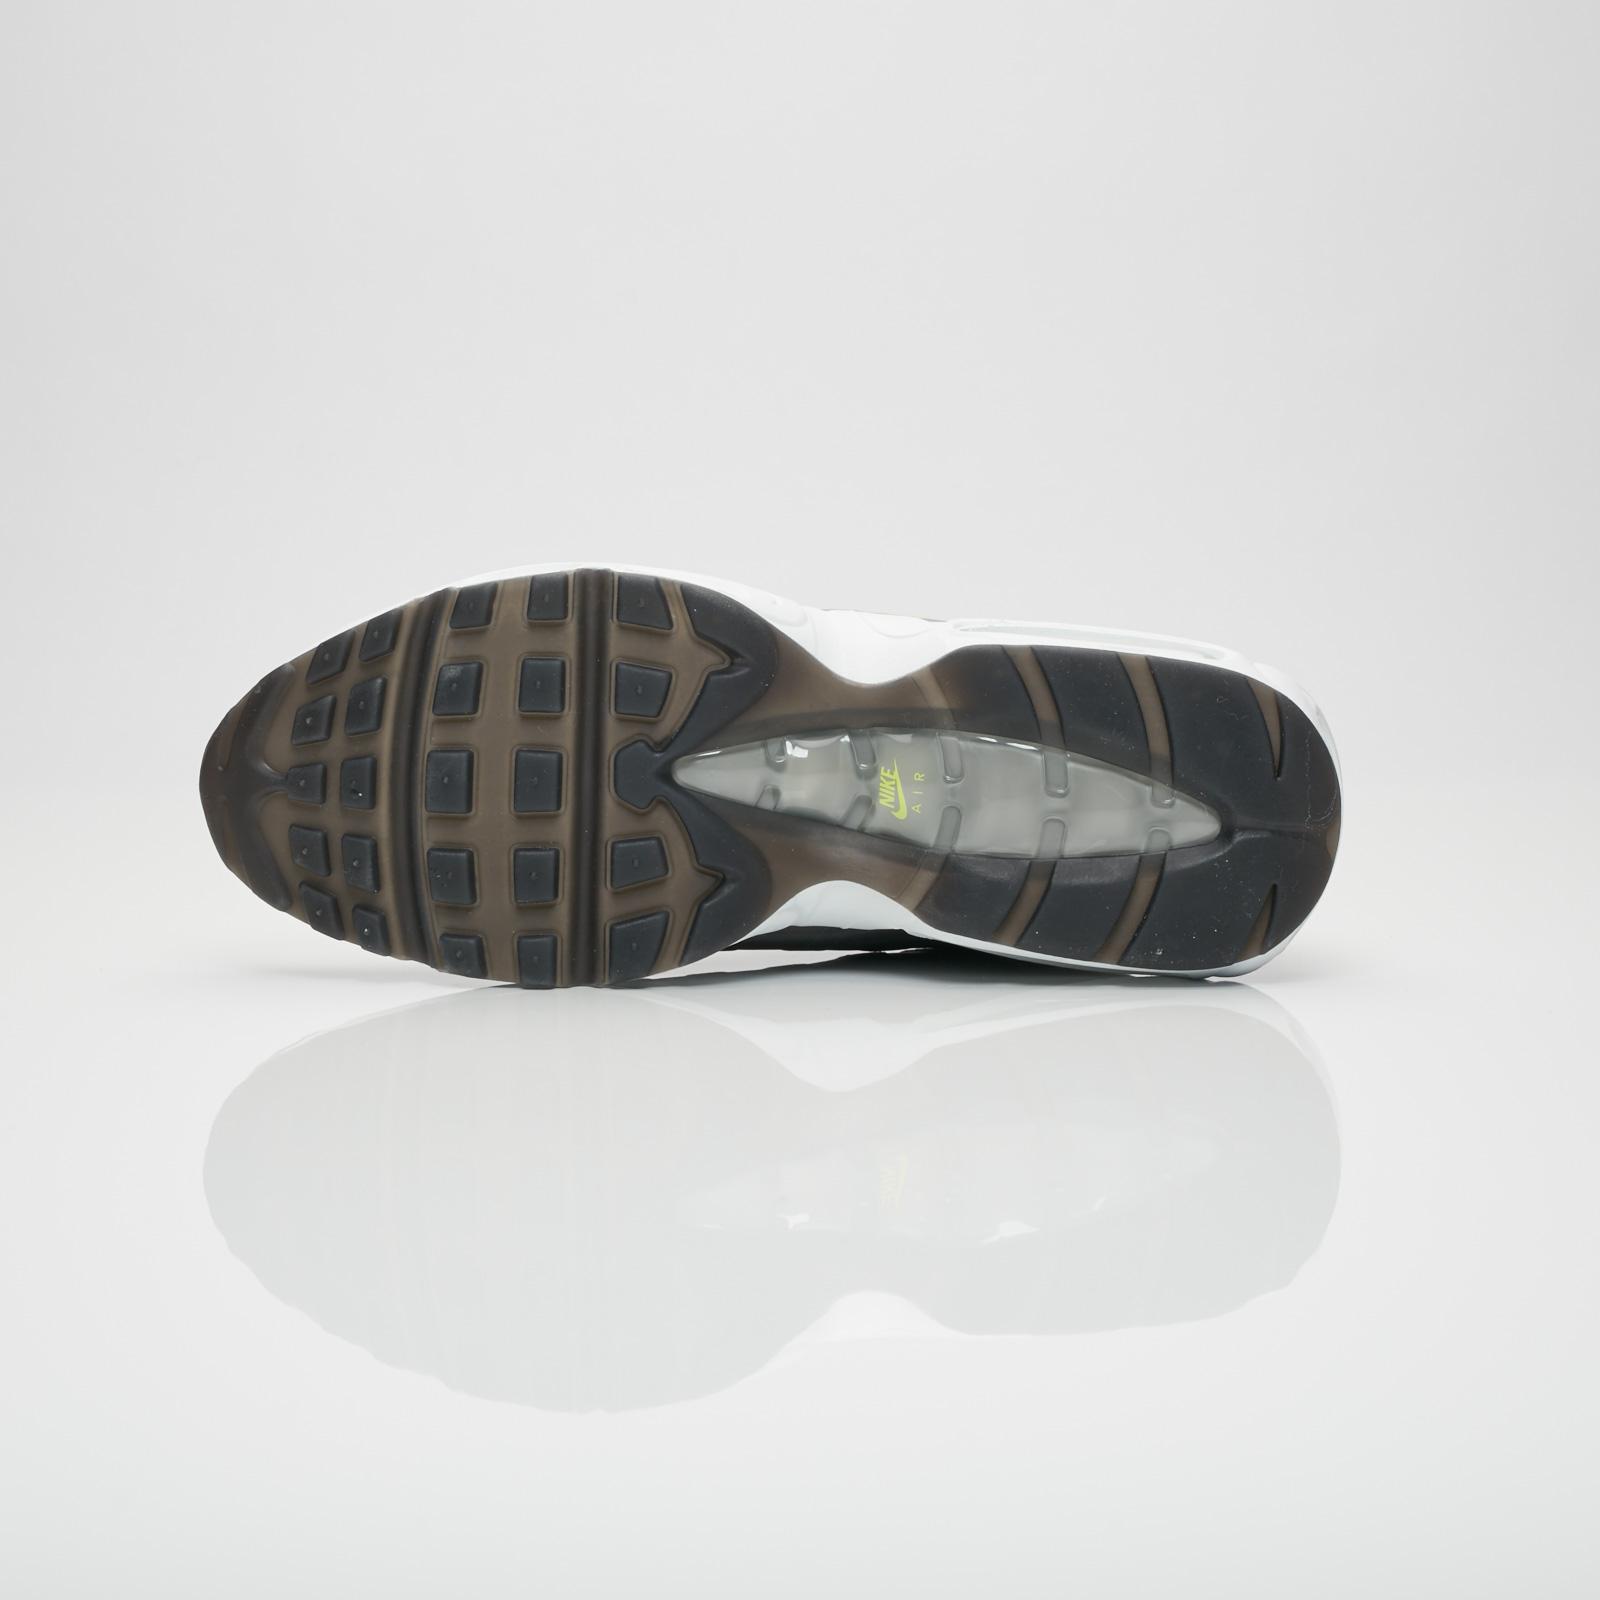 2e5ba281c3 Nike Air Max 95 NS GPX - Aj7183-001 - Sneakersnstuff | sneakers ...